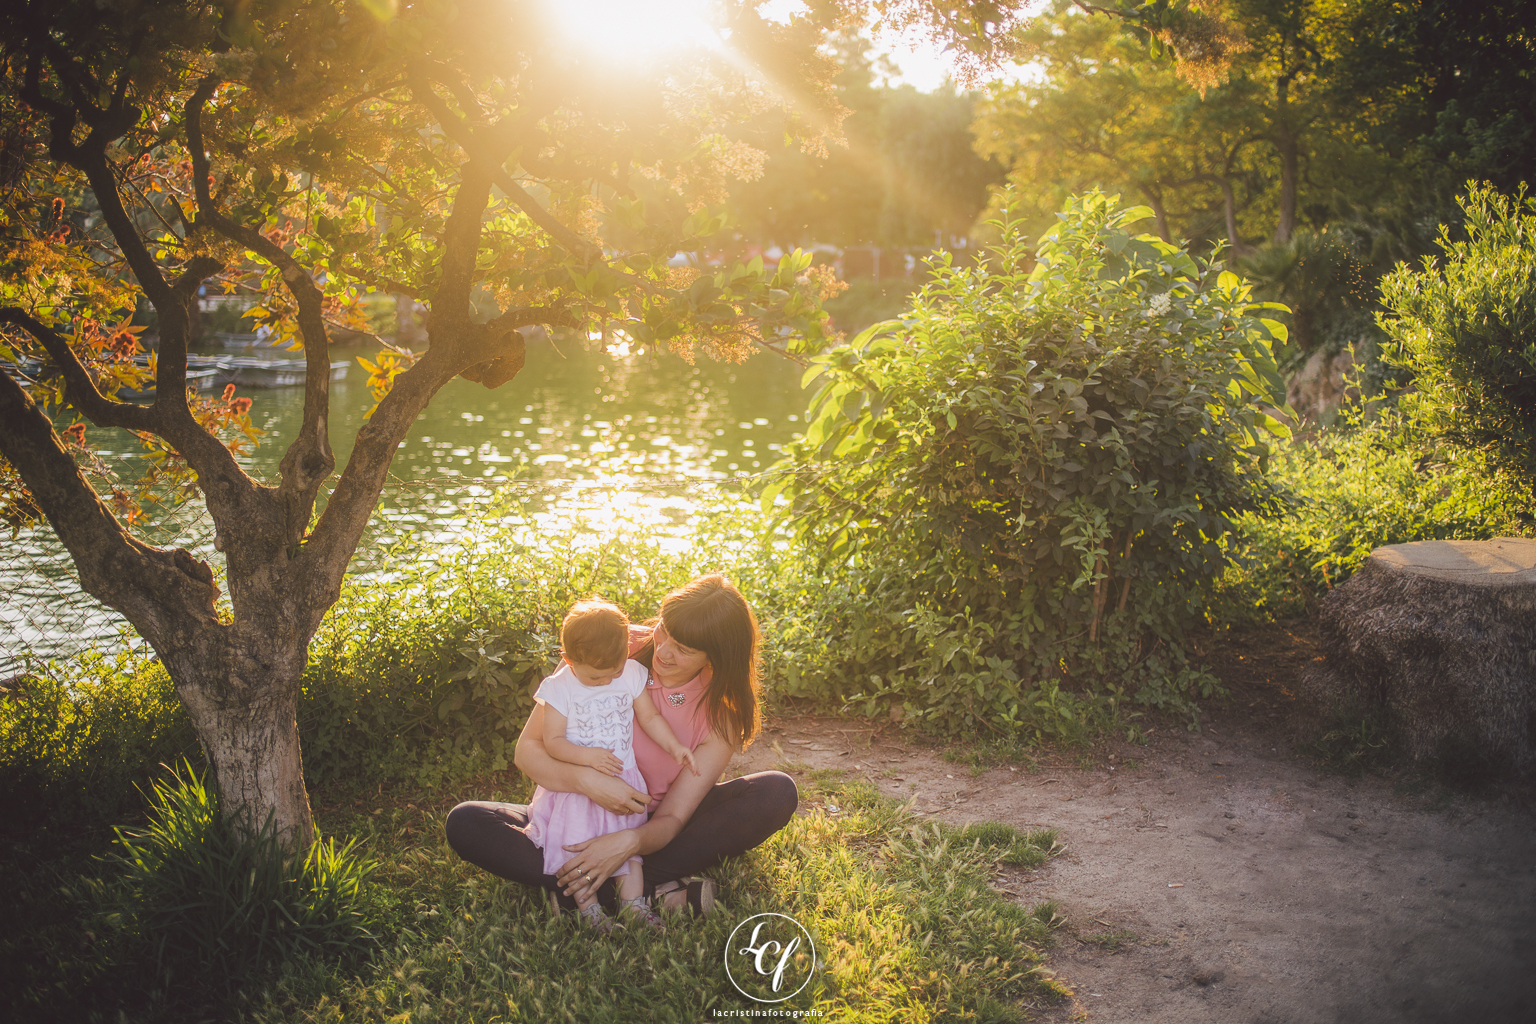 Fotógrafo de familia Barcelona :: Atardecer en el Parque de la Ciutadella :: Fotografía familiar :: Fotografía natural :: Reportaje de bebés en exterior :: Best Barcelona photographer